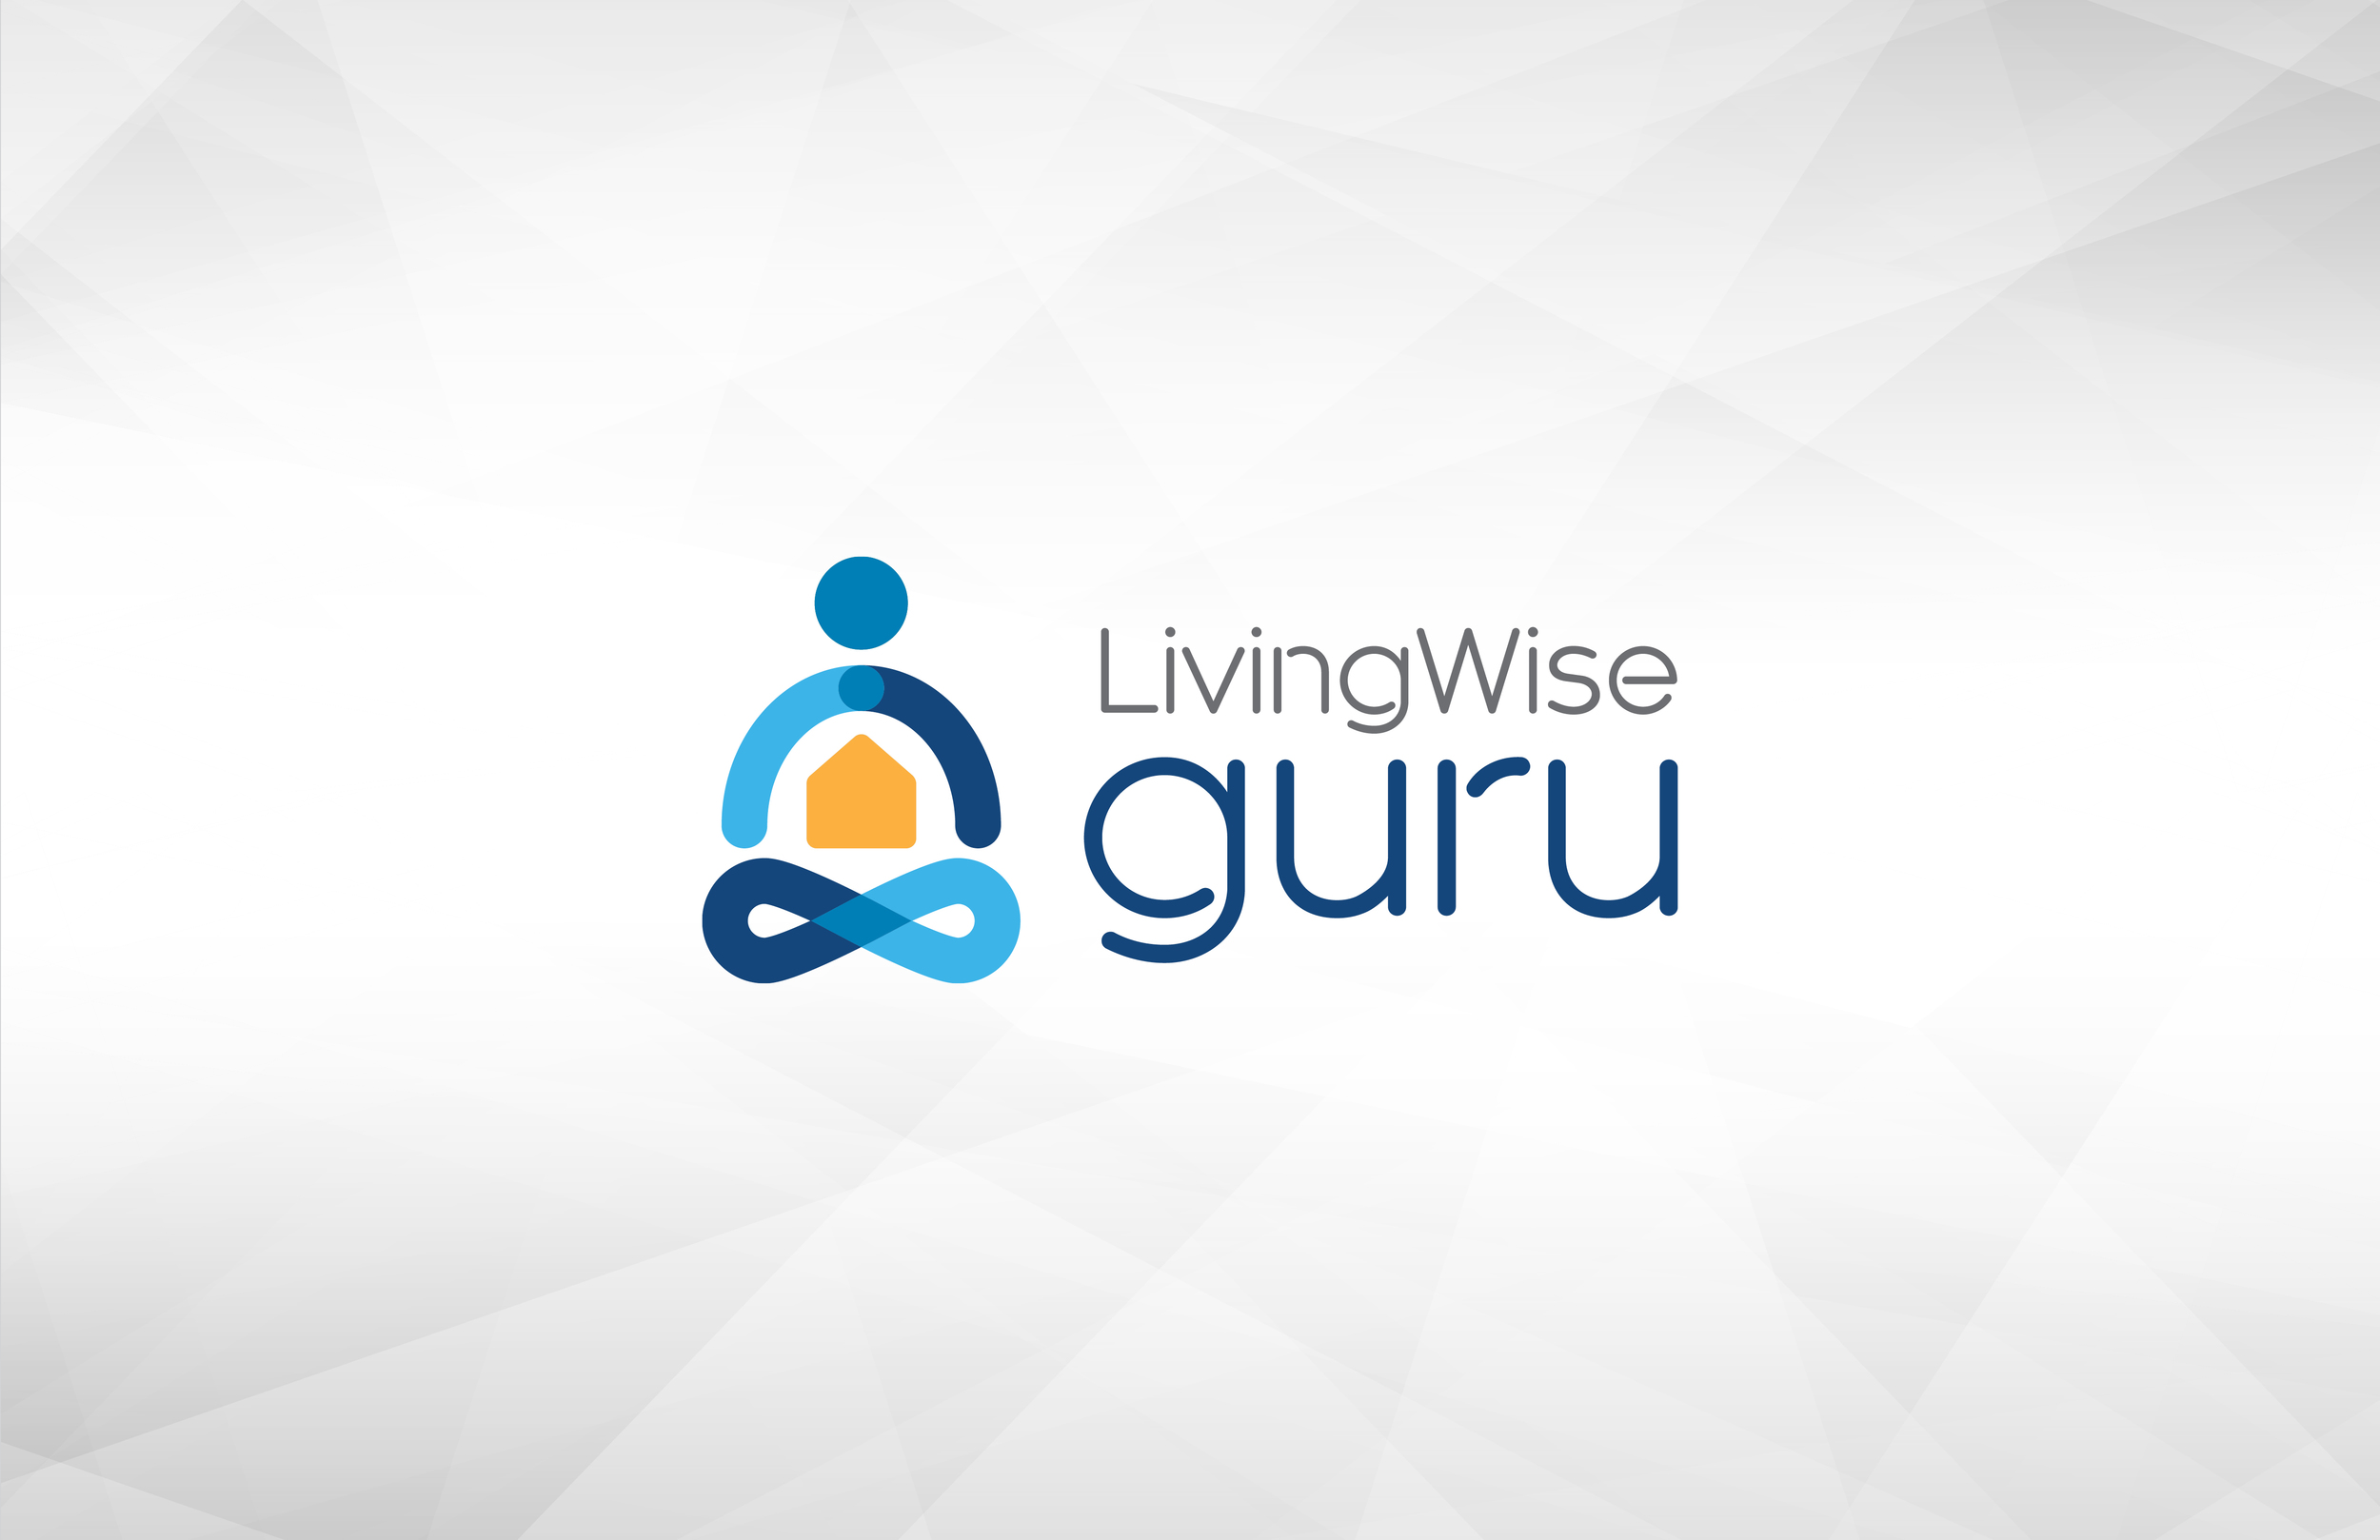 LivingWise Guru logo design